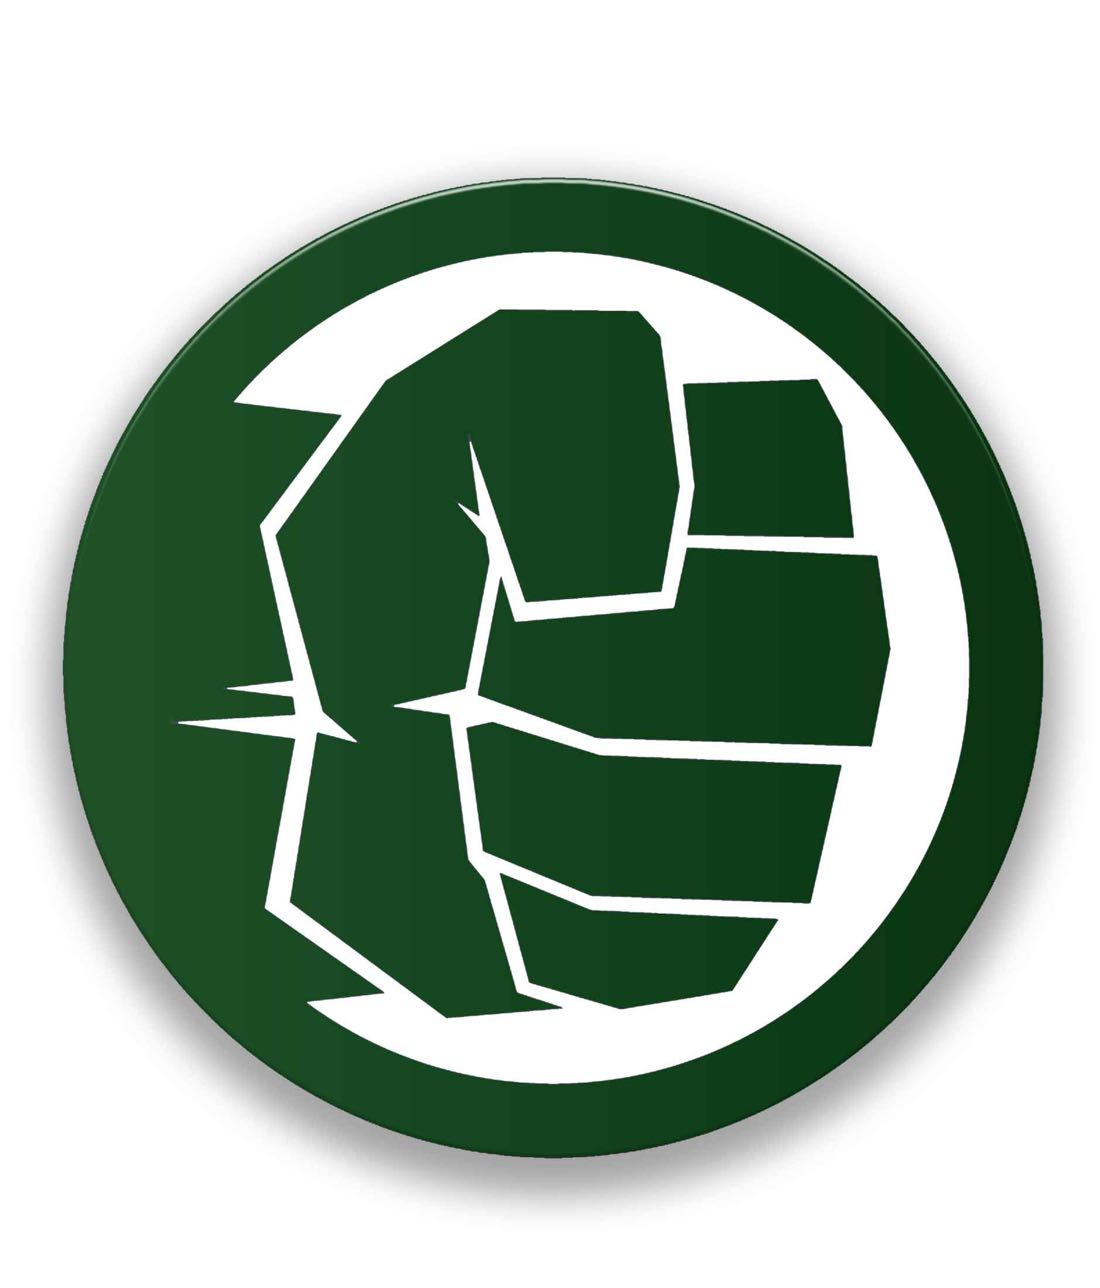 Hulk Fist Punch.